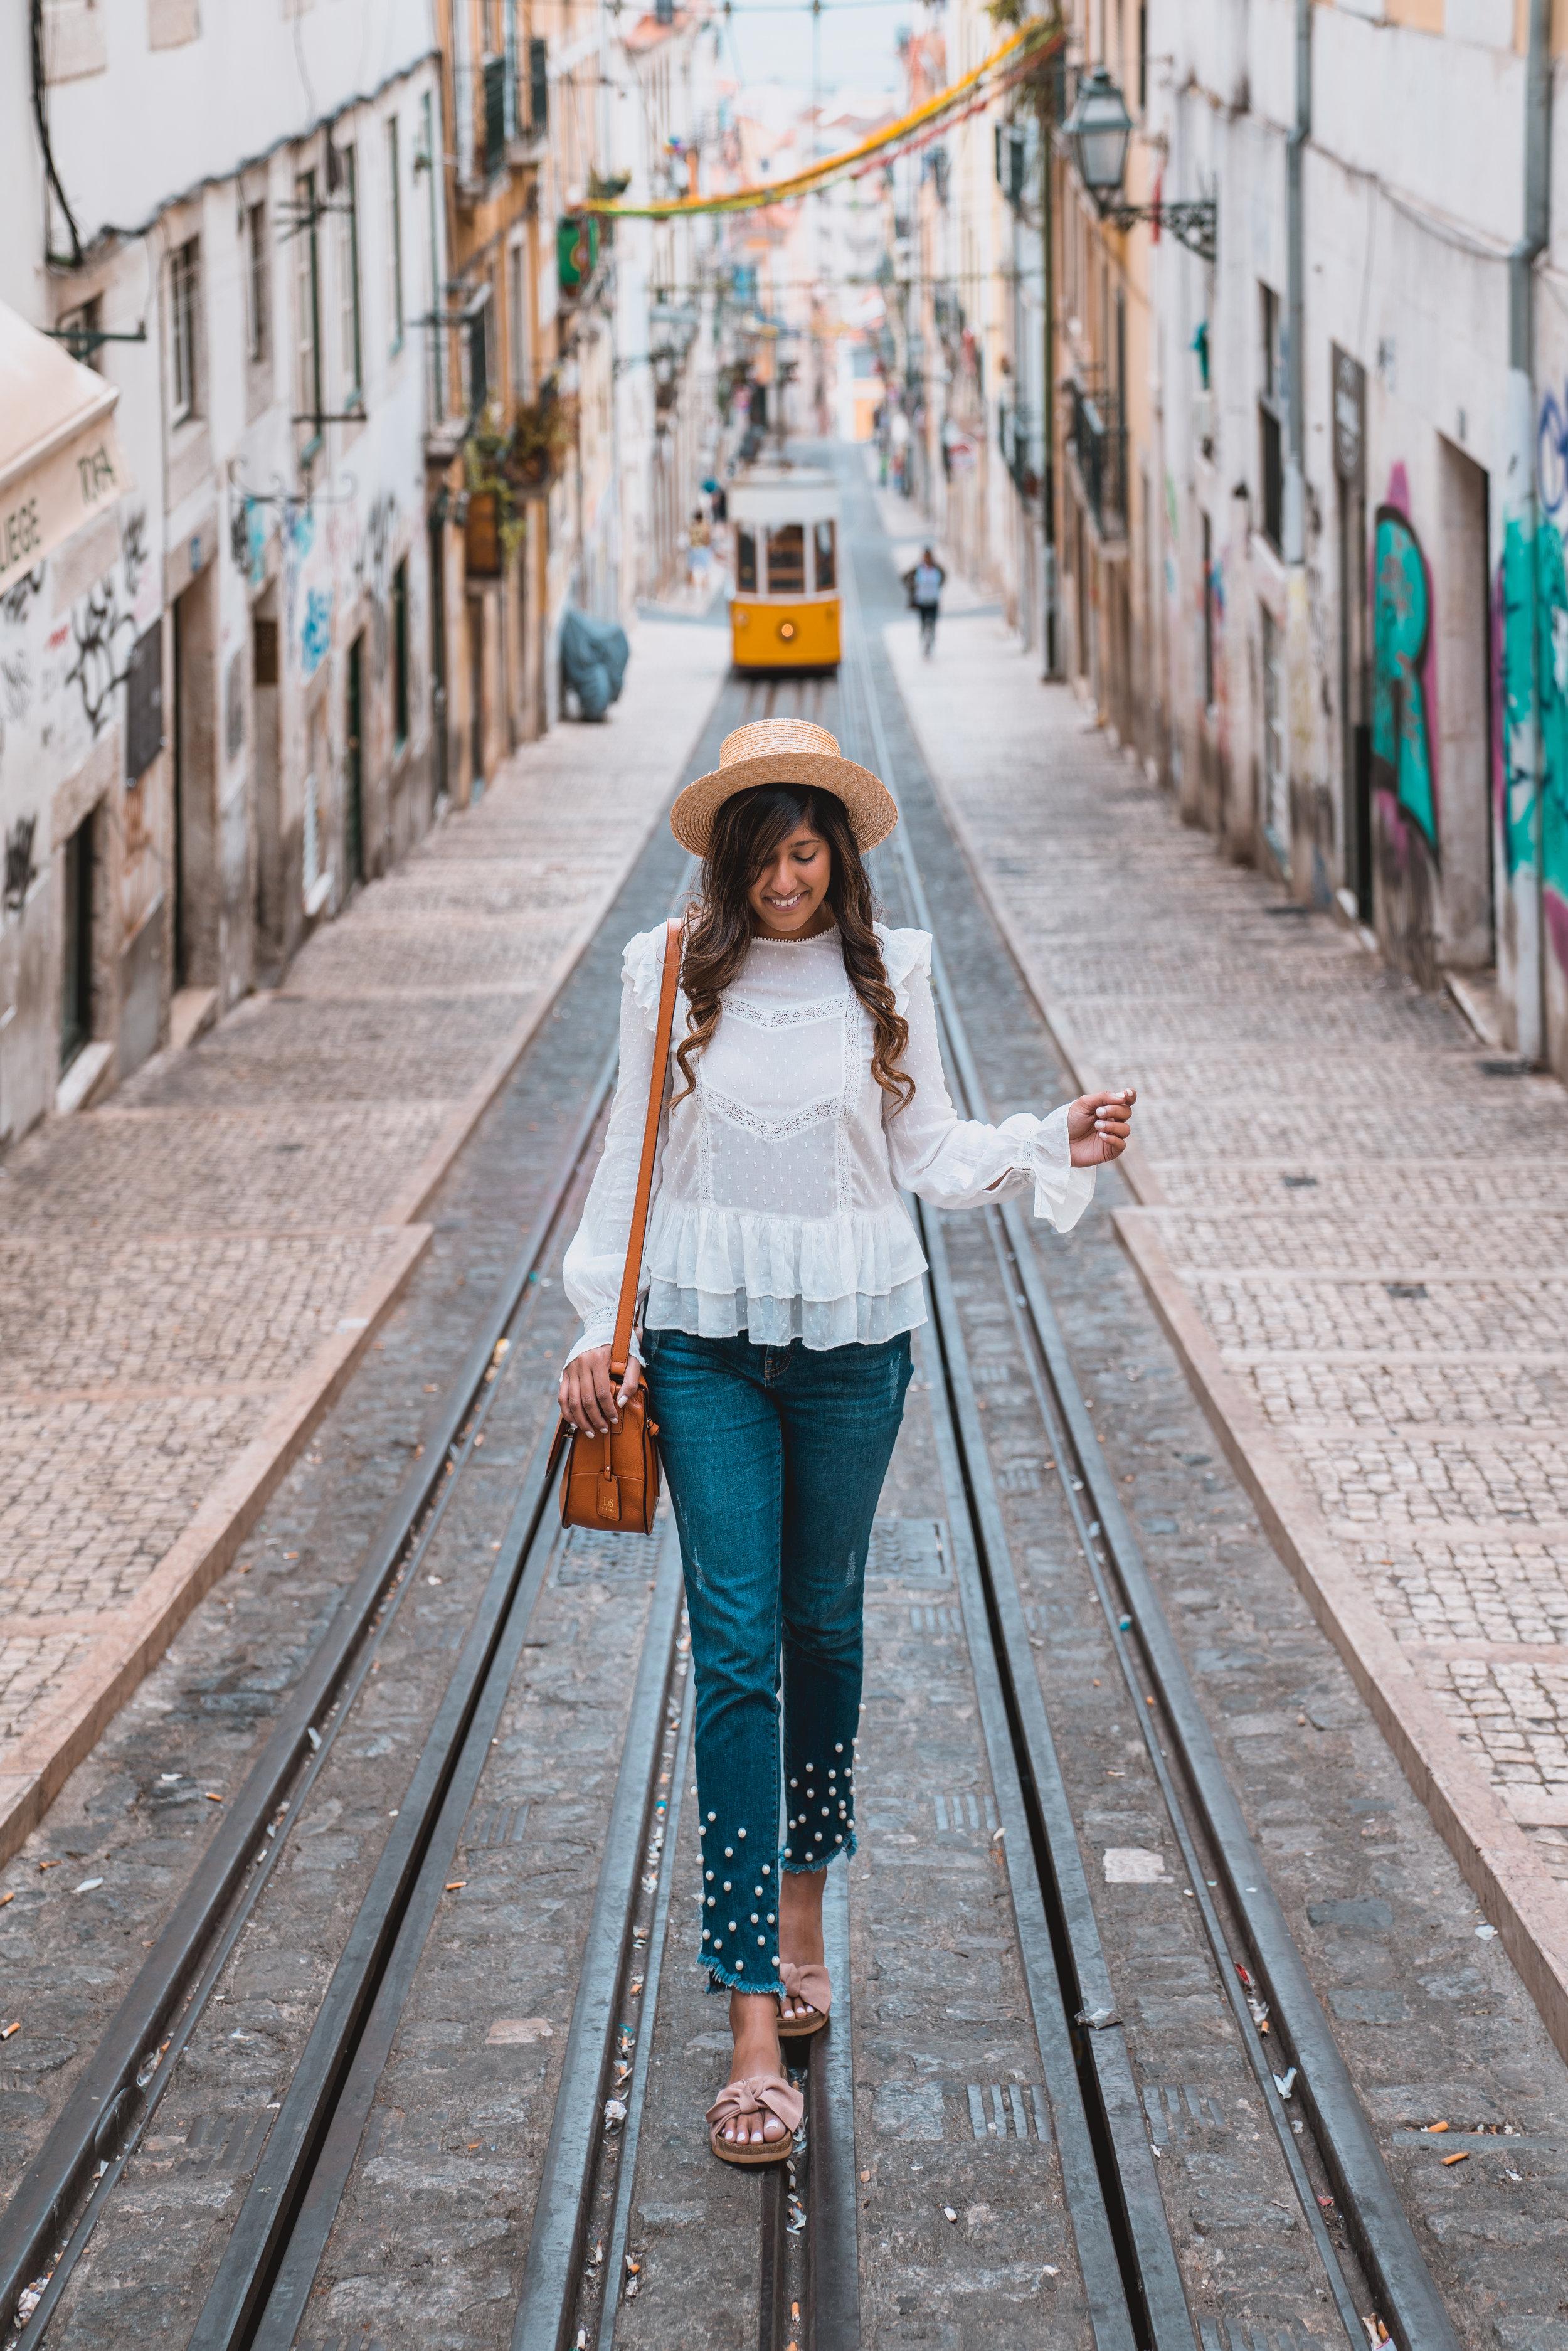 Tram 28 in Lisbon Portugal